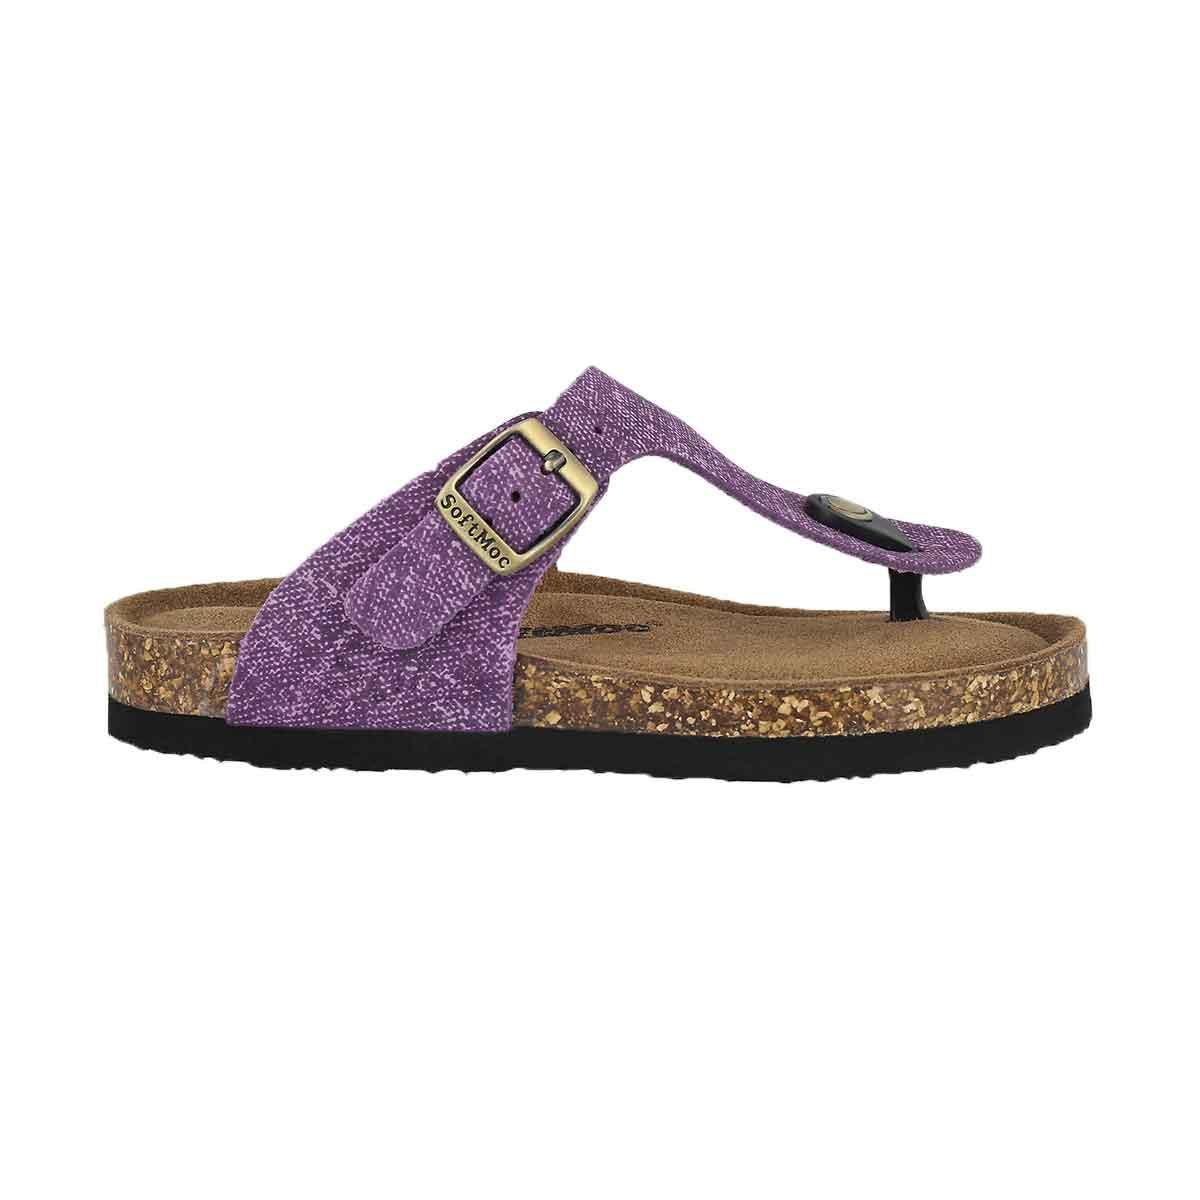 Grls Angy 5 purp memory foam thng sandal